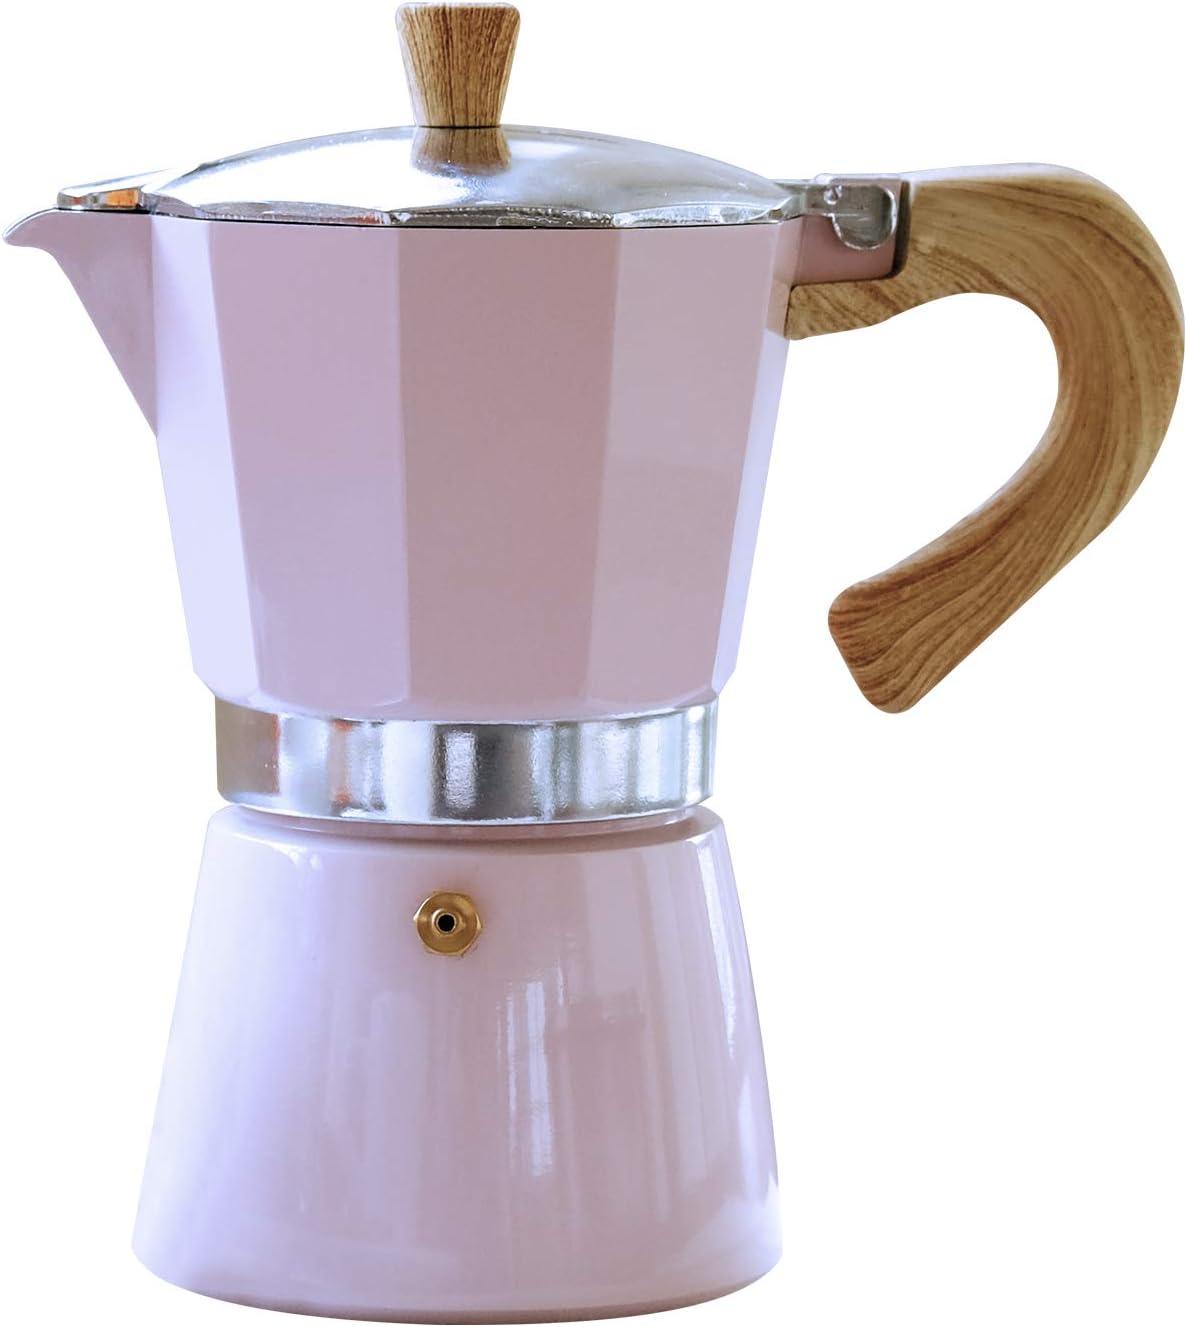 Gnali & Zani VEZ006/IND/PINK Venezia - Cafetera de espresso, color rosa, 6 tazas, cafetera expreso de aluminio